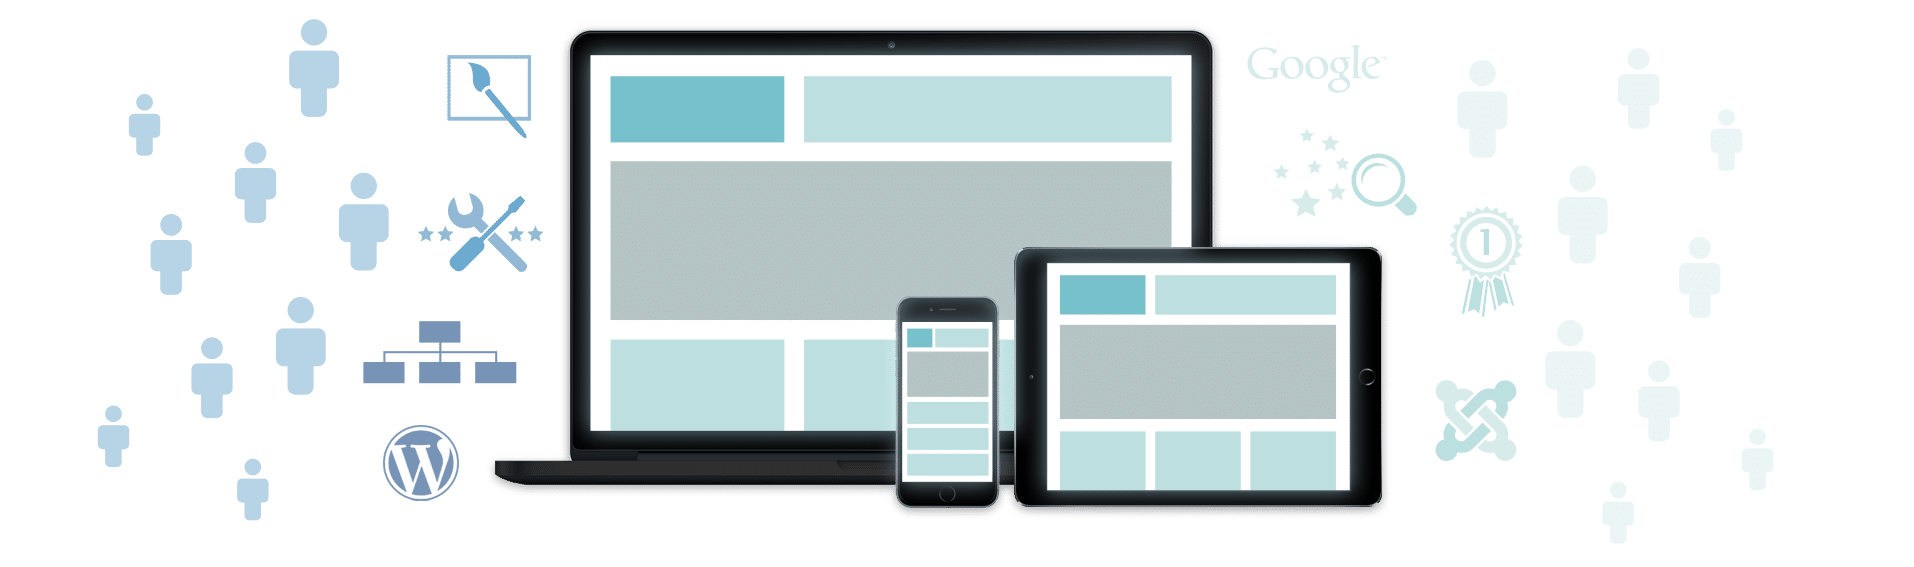 Header Wunderbar wirksame Websites